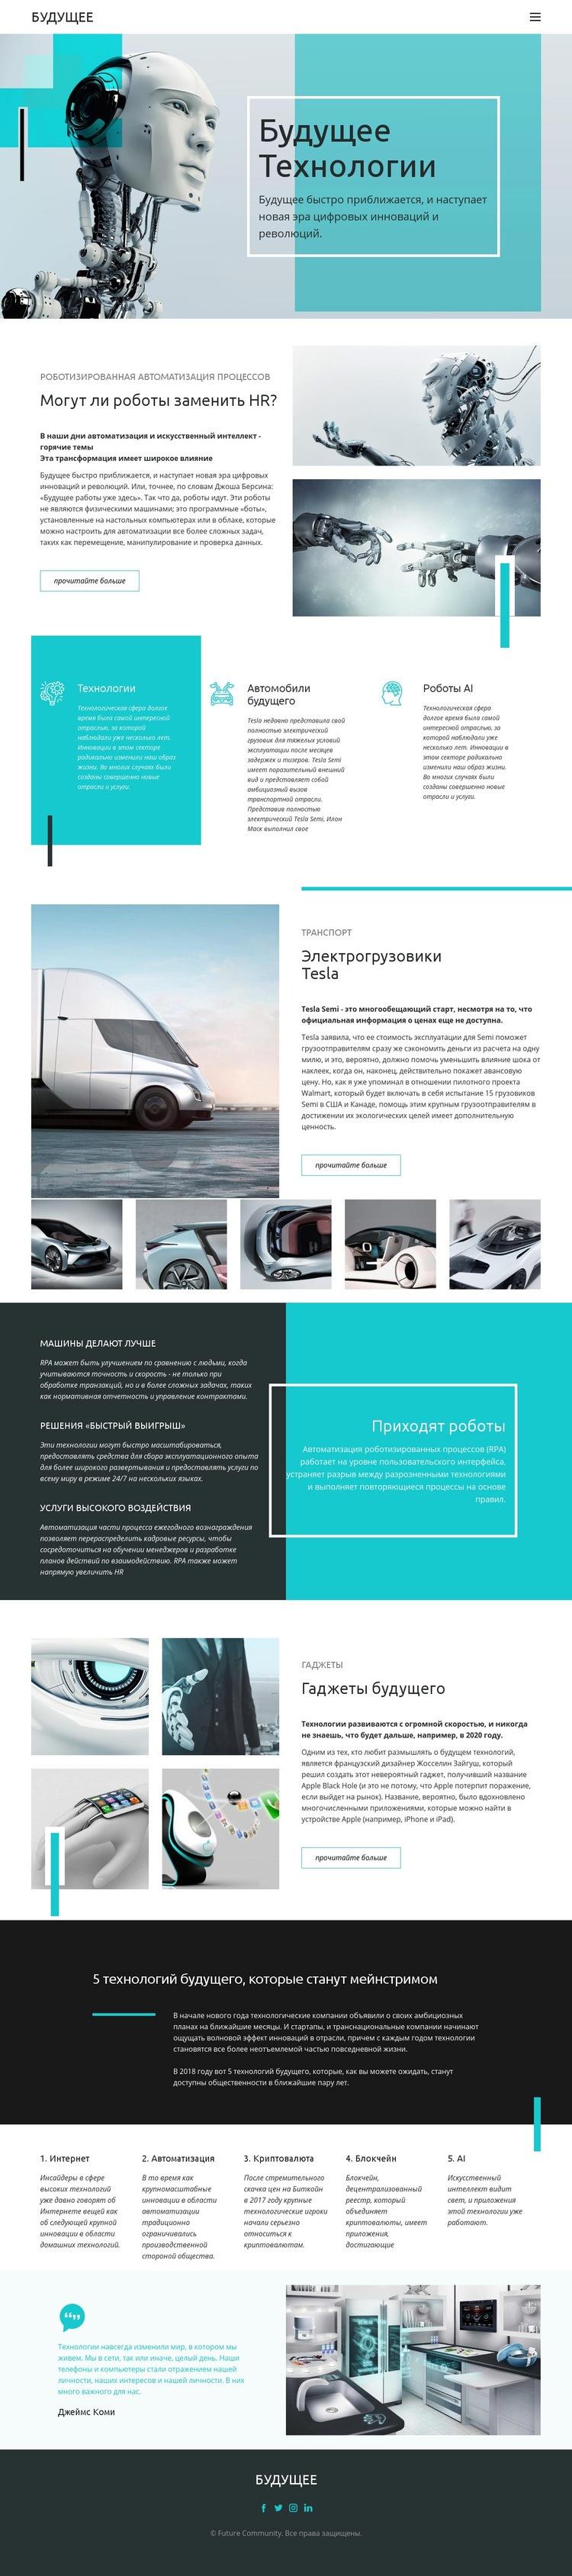 Будущие технологии Шаблон веб-сайта